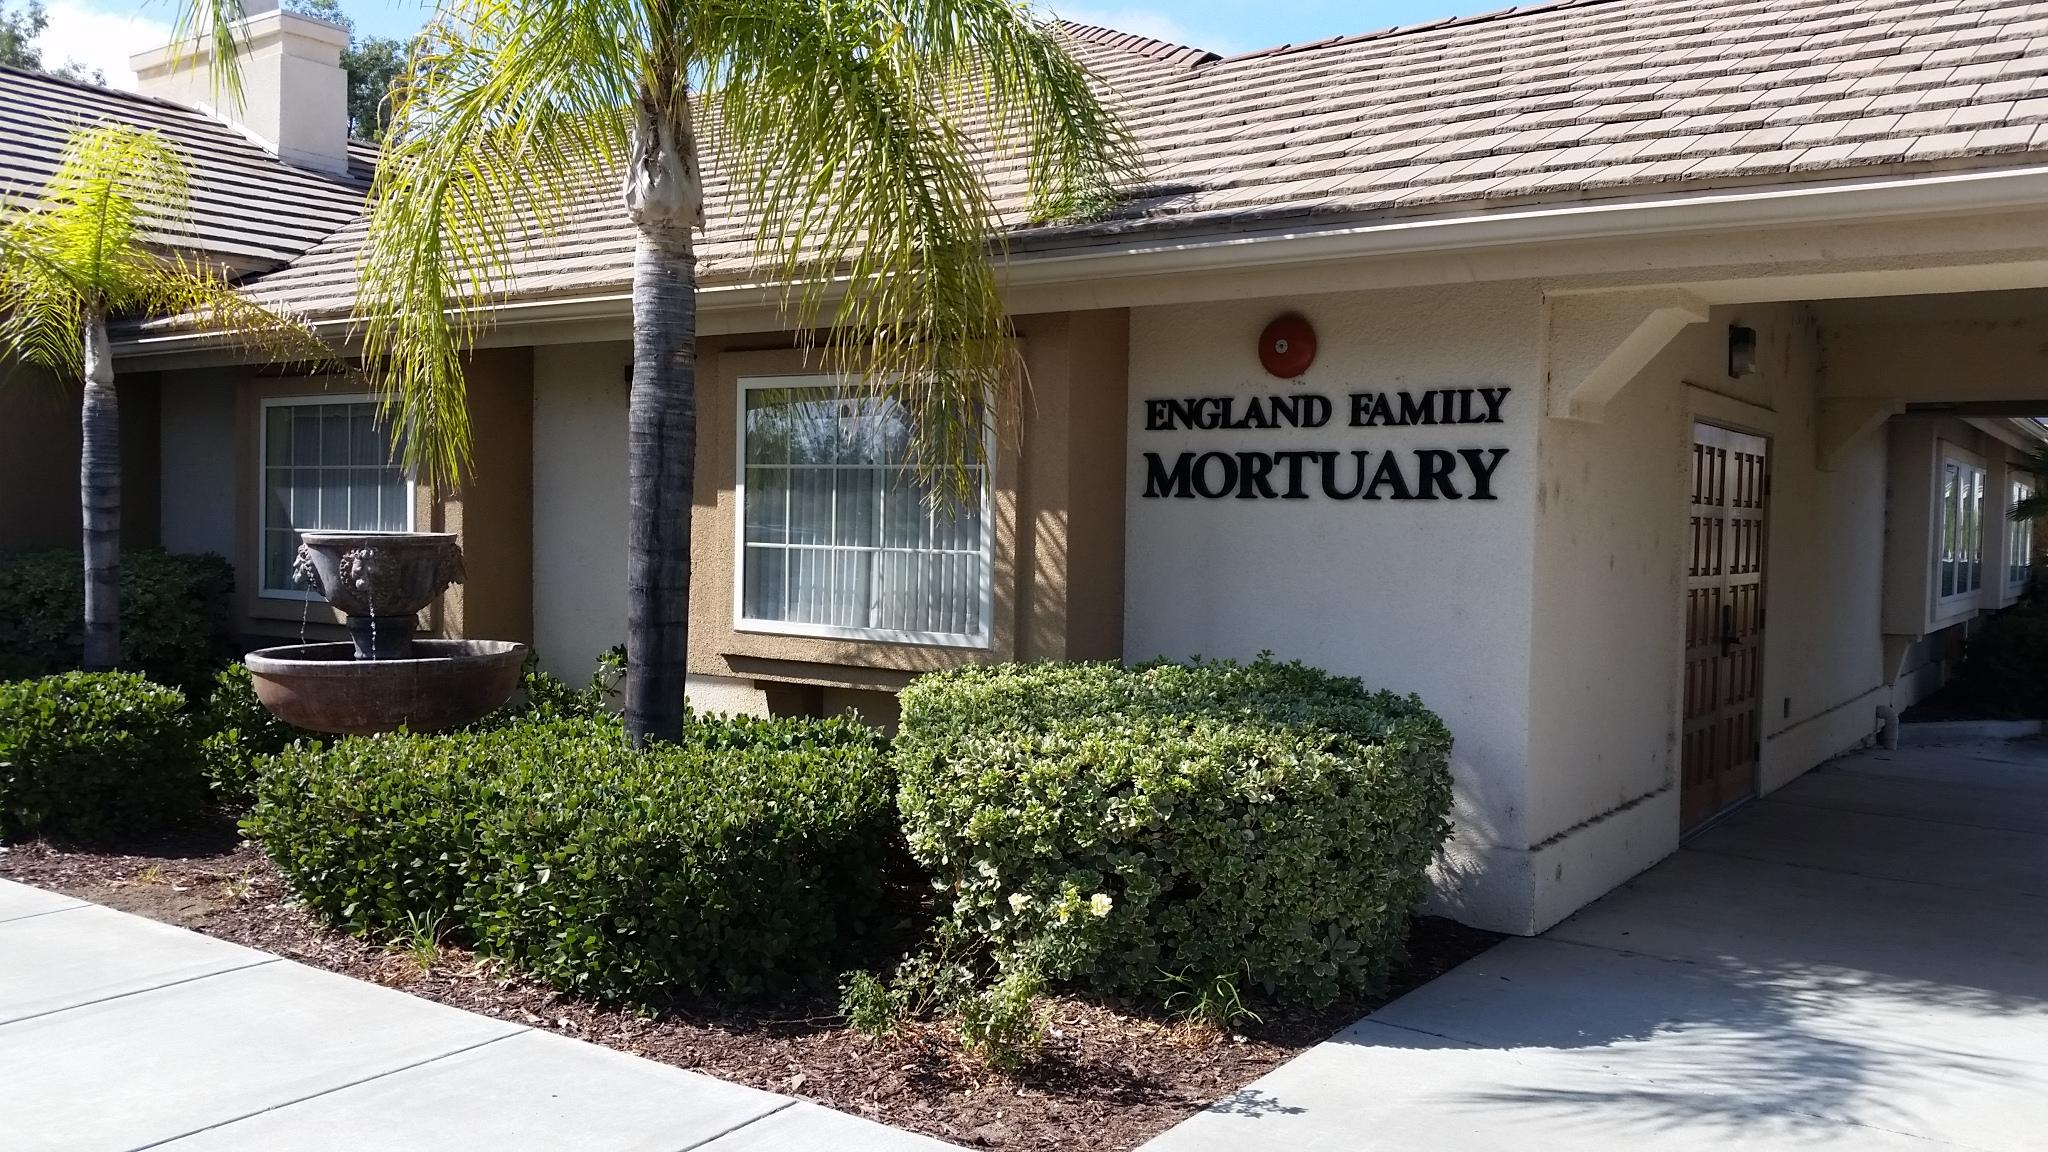 England Family Mortuary - Temecula, CA - Business Information